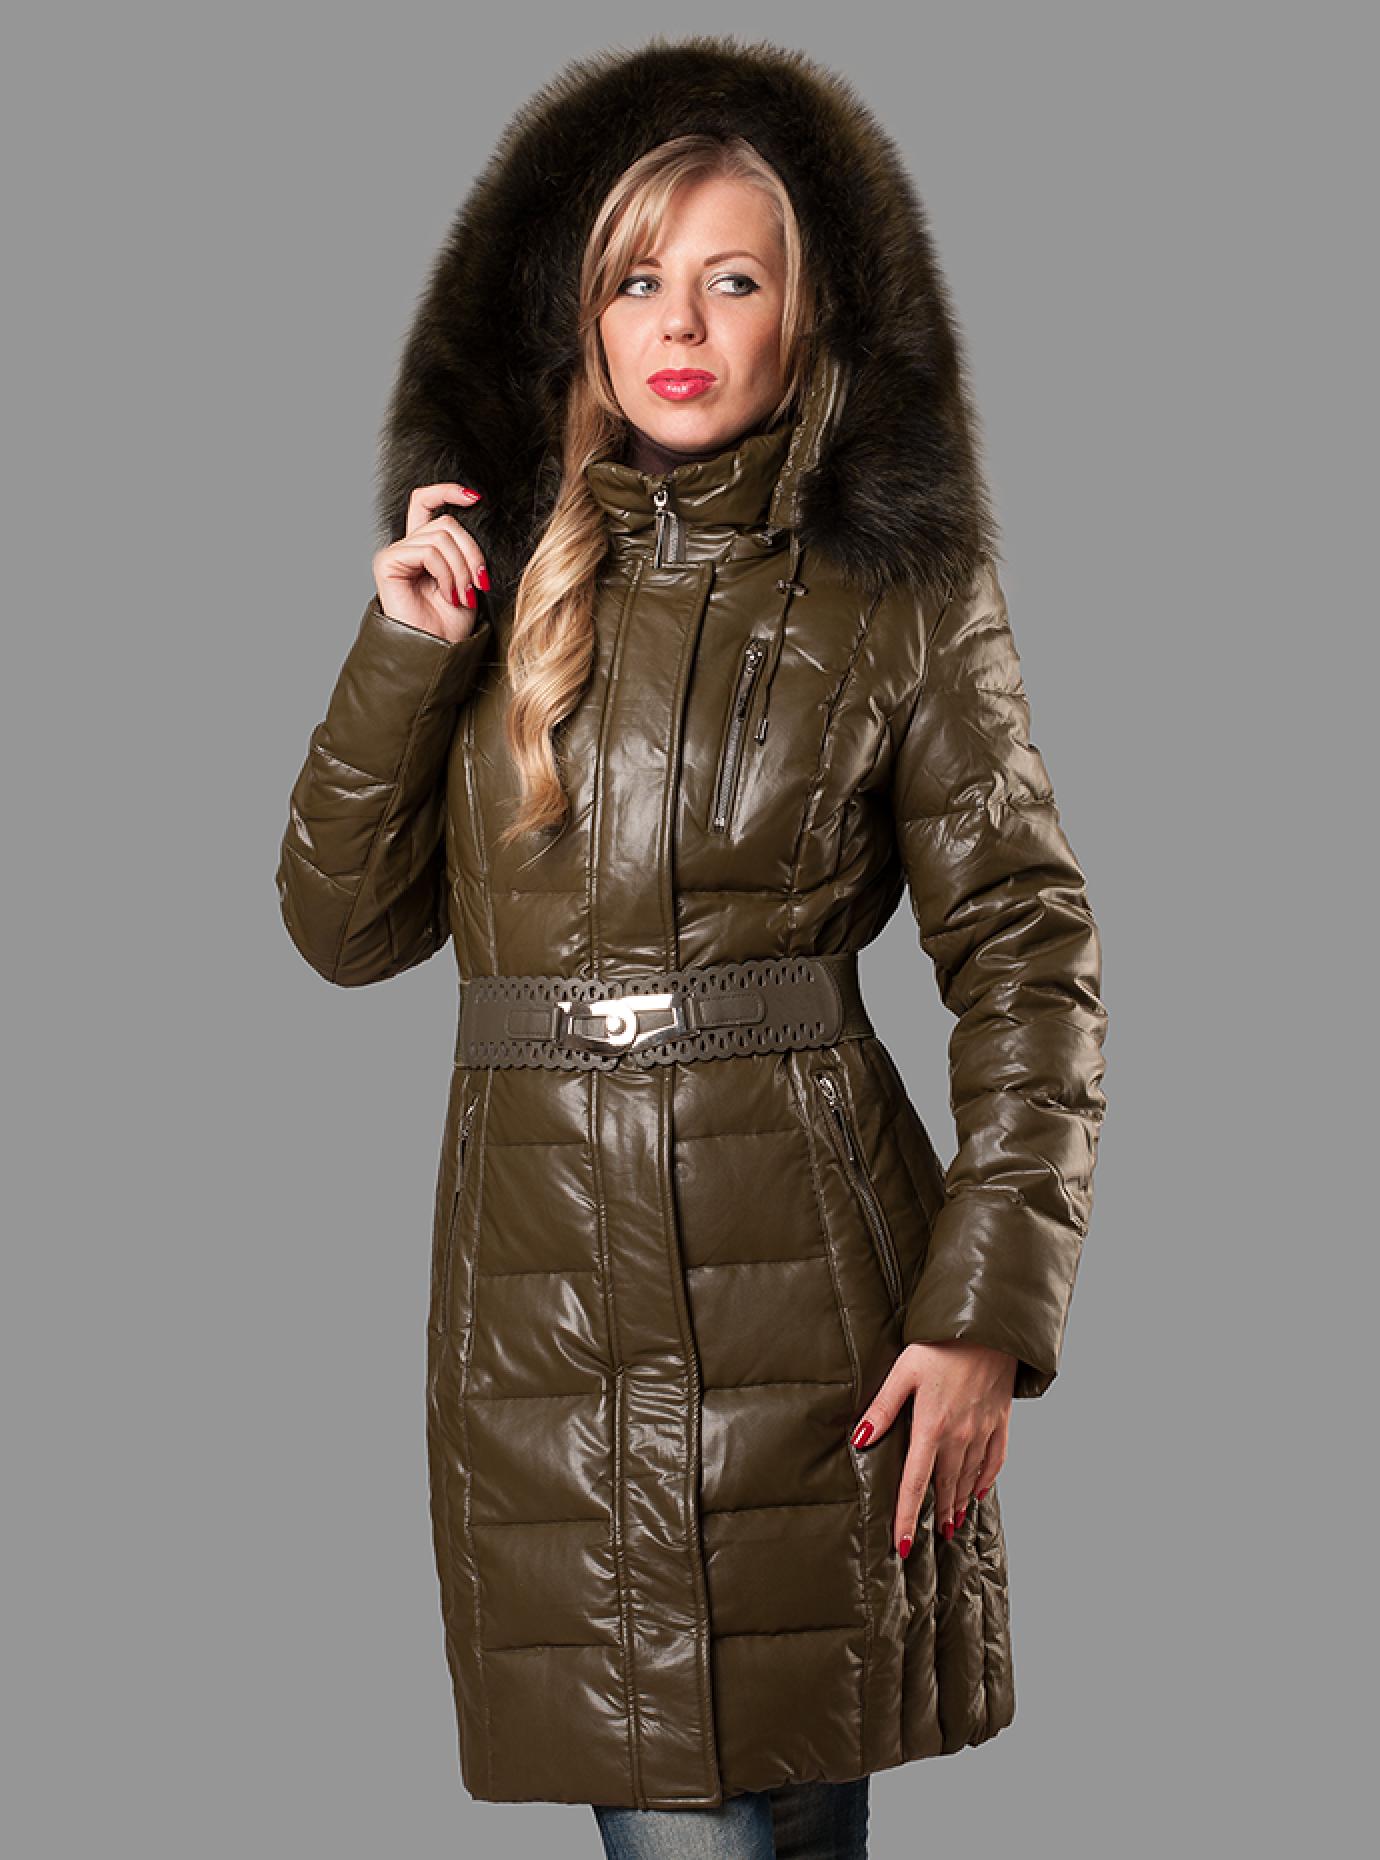 Пуховик женский зимний Коричневый S (05-ZZ19086): фото - Alster.ua